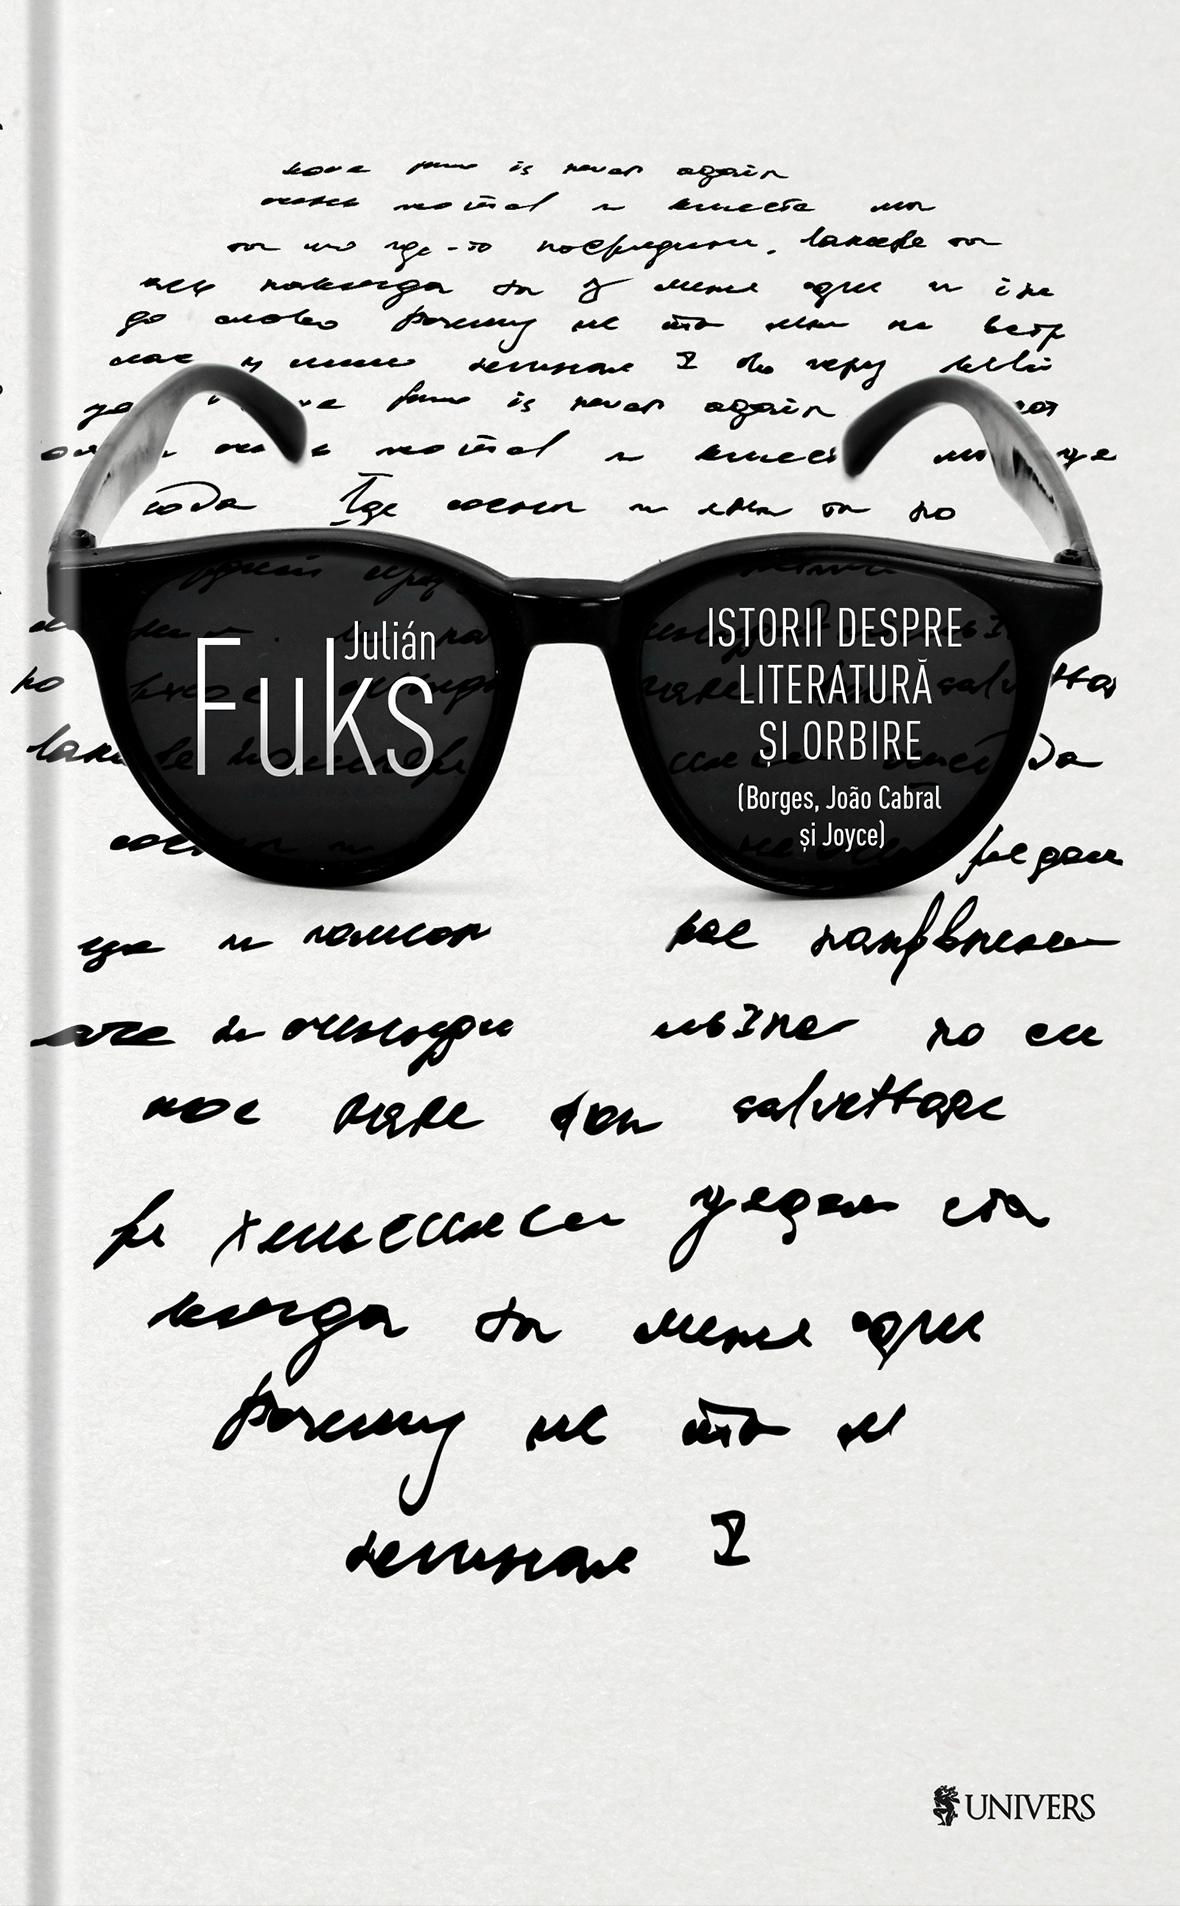 Istorii despre literatura si orbire | Julian Fuks